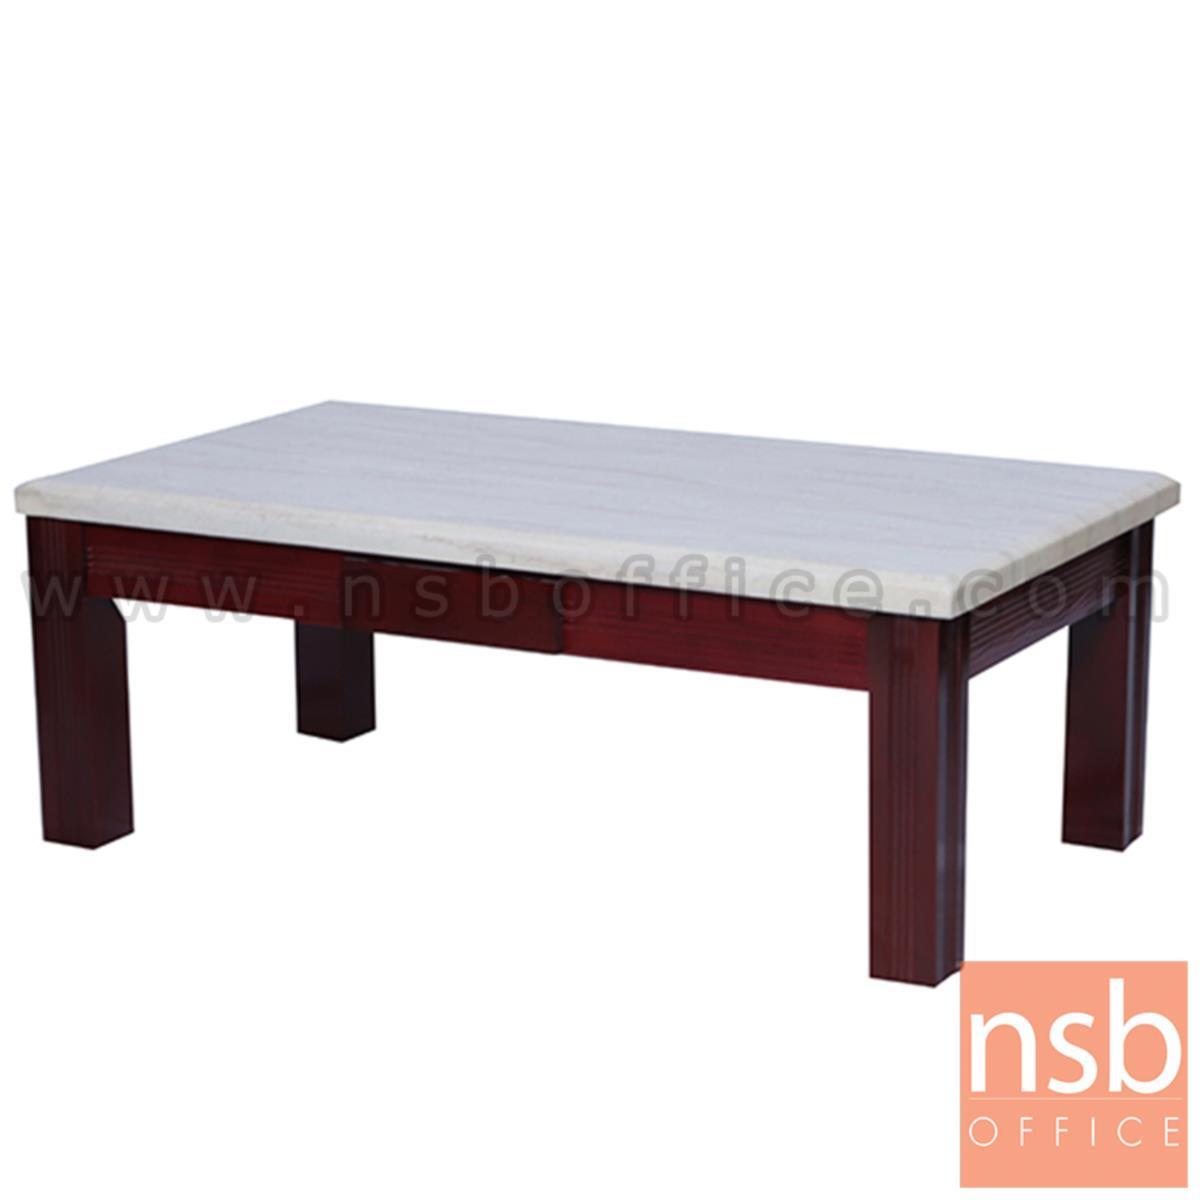 B13A282:โต๊ะกลางหินอ่อน รุ่น Albany (อัลบานี่) ขนาด 120W cm. ขาไม้